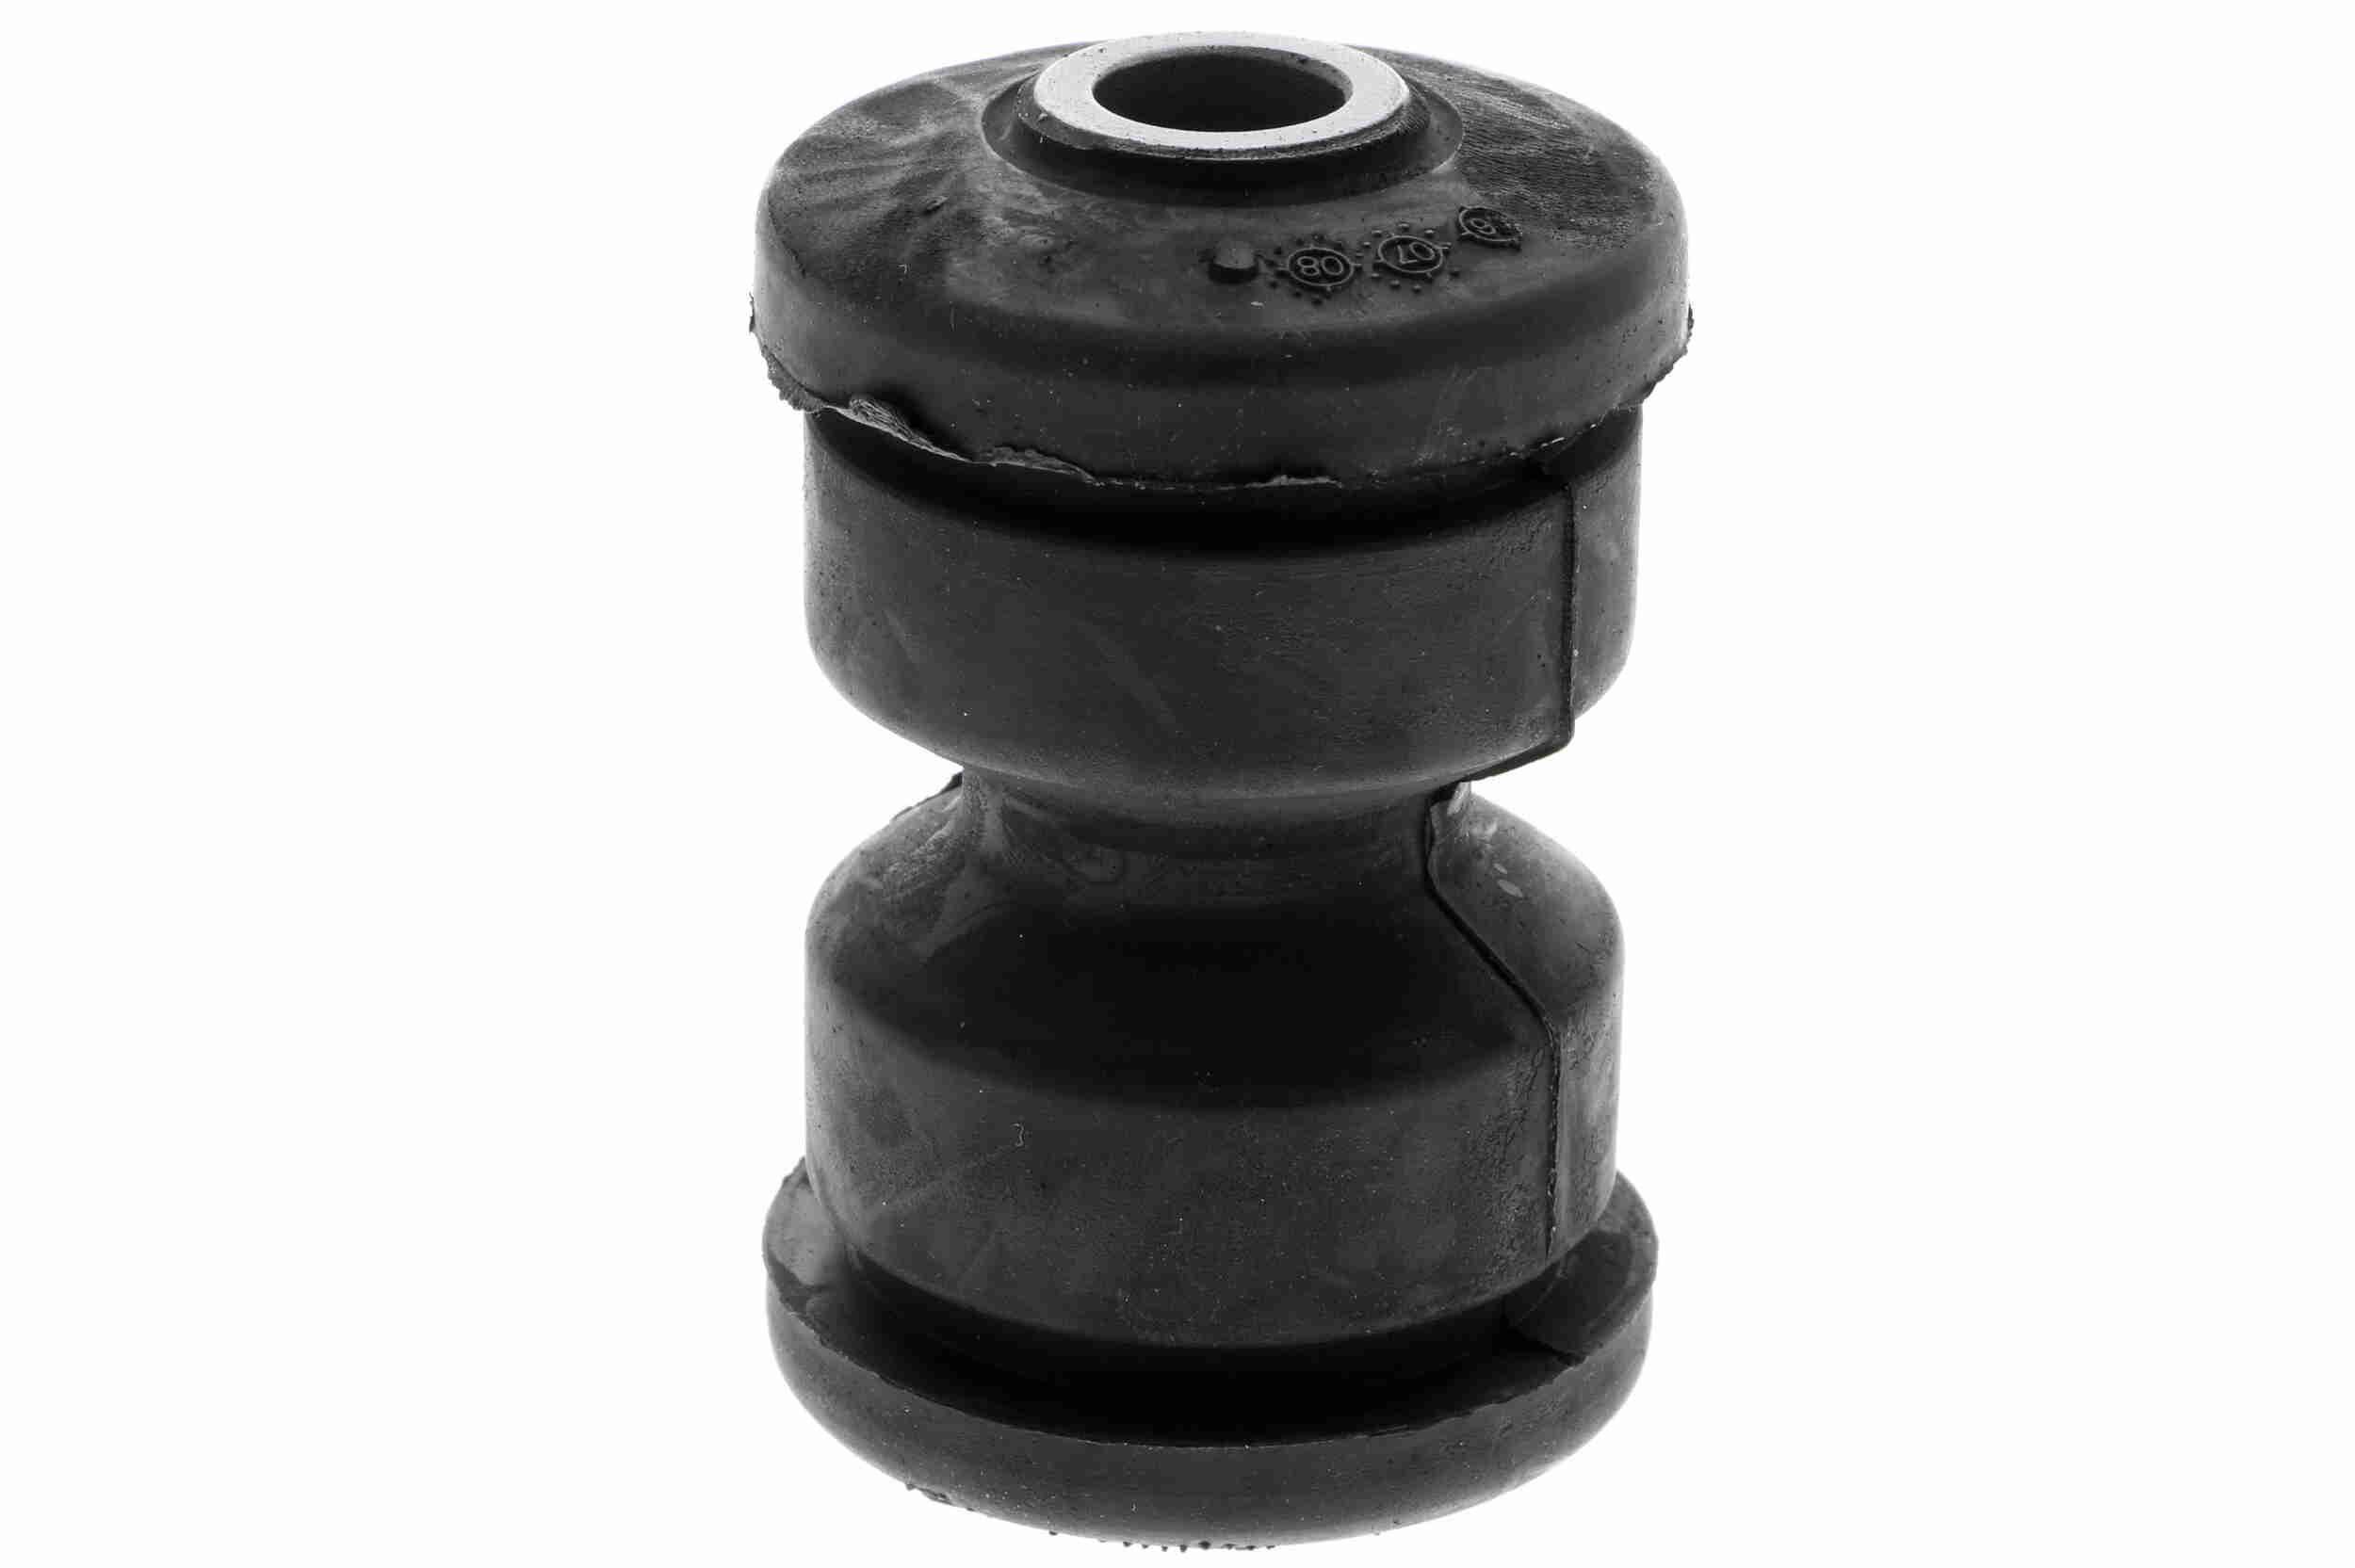 V30-7275 VAICO Original VAICO Qualität, Gummimetalllager, Vorderachse, Querlenker Lagerung, Lenker V30-7275 günstig kaufen